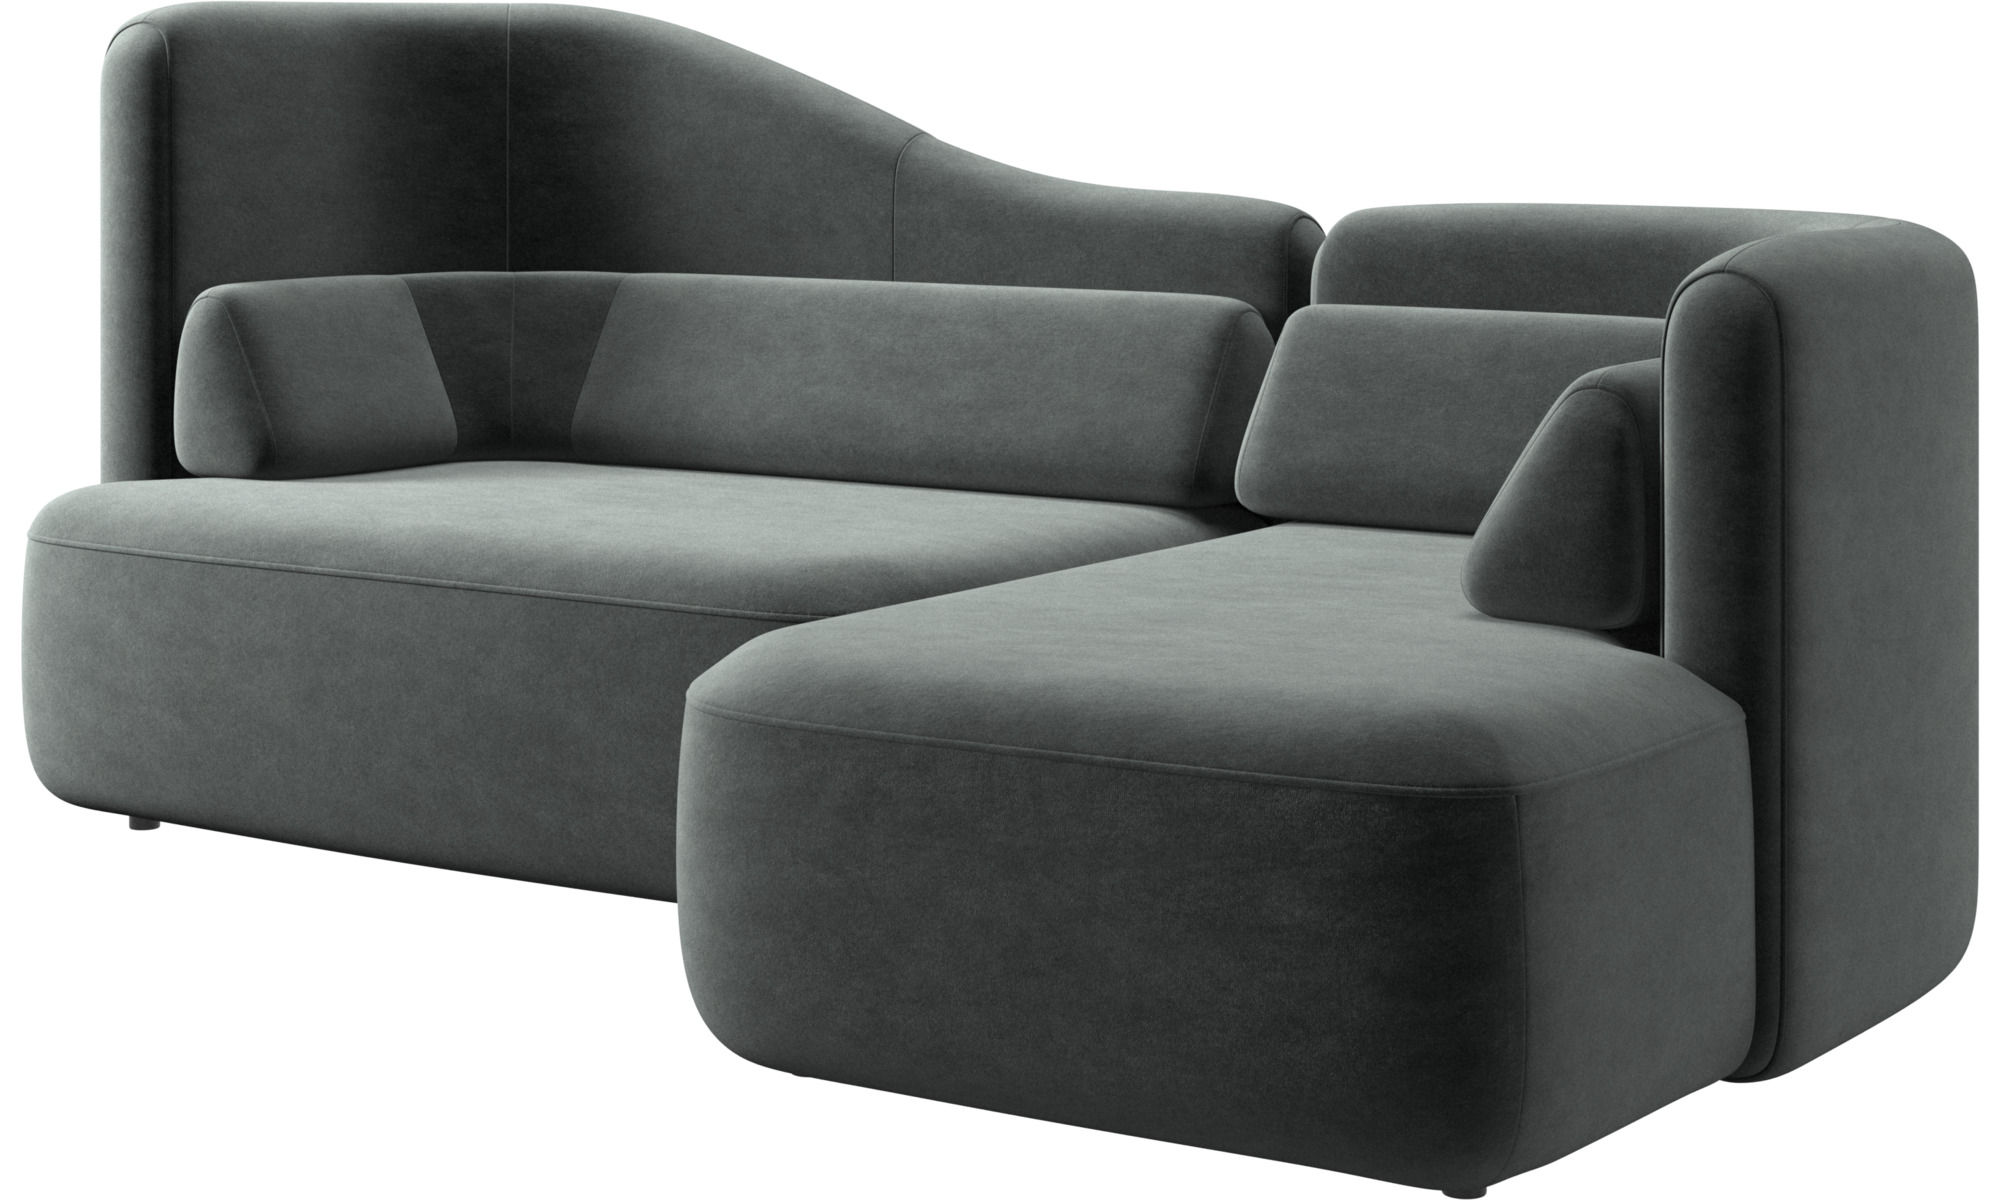 modular sofas ottawa sofa boconcept. Black Bedroom Furniture Sets. Home Design Ideas